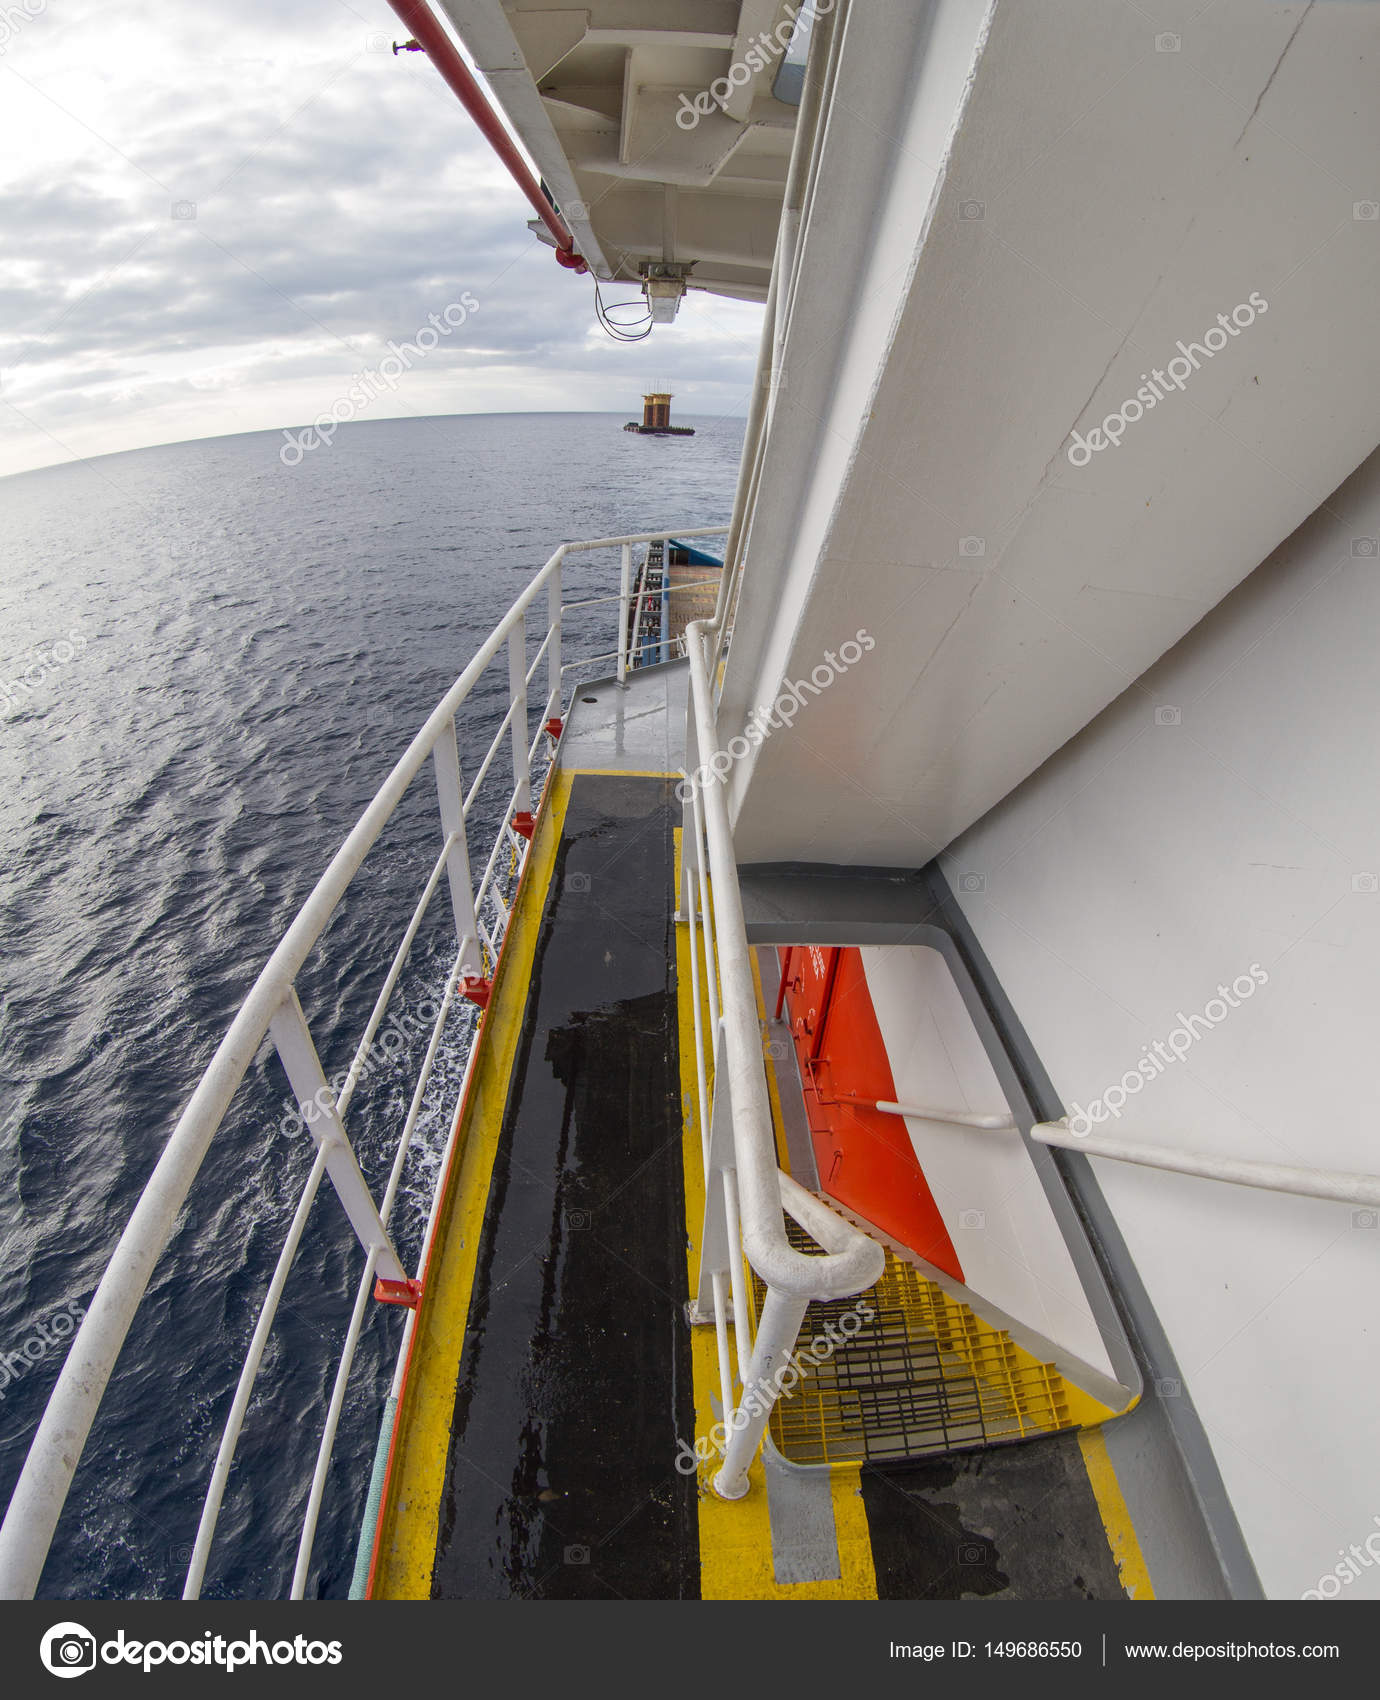 Vessel, job, ship's parts  — Stock Photo © seamju #149686550